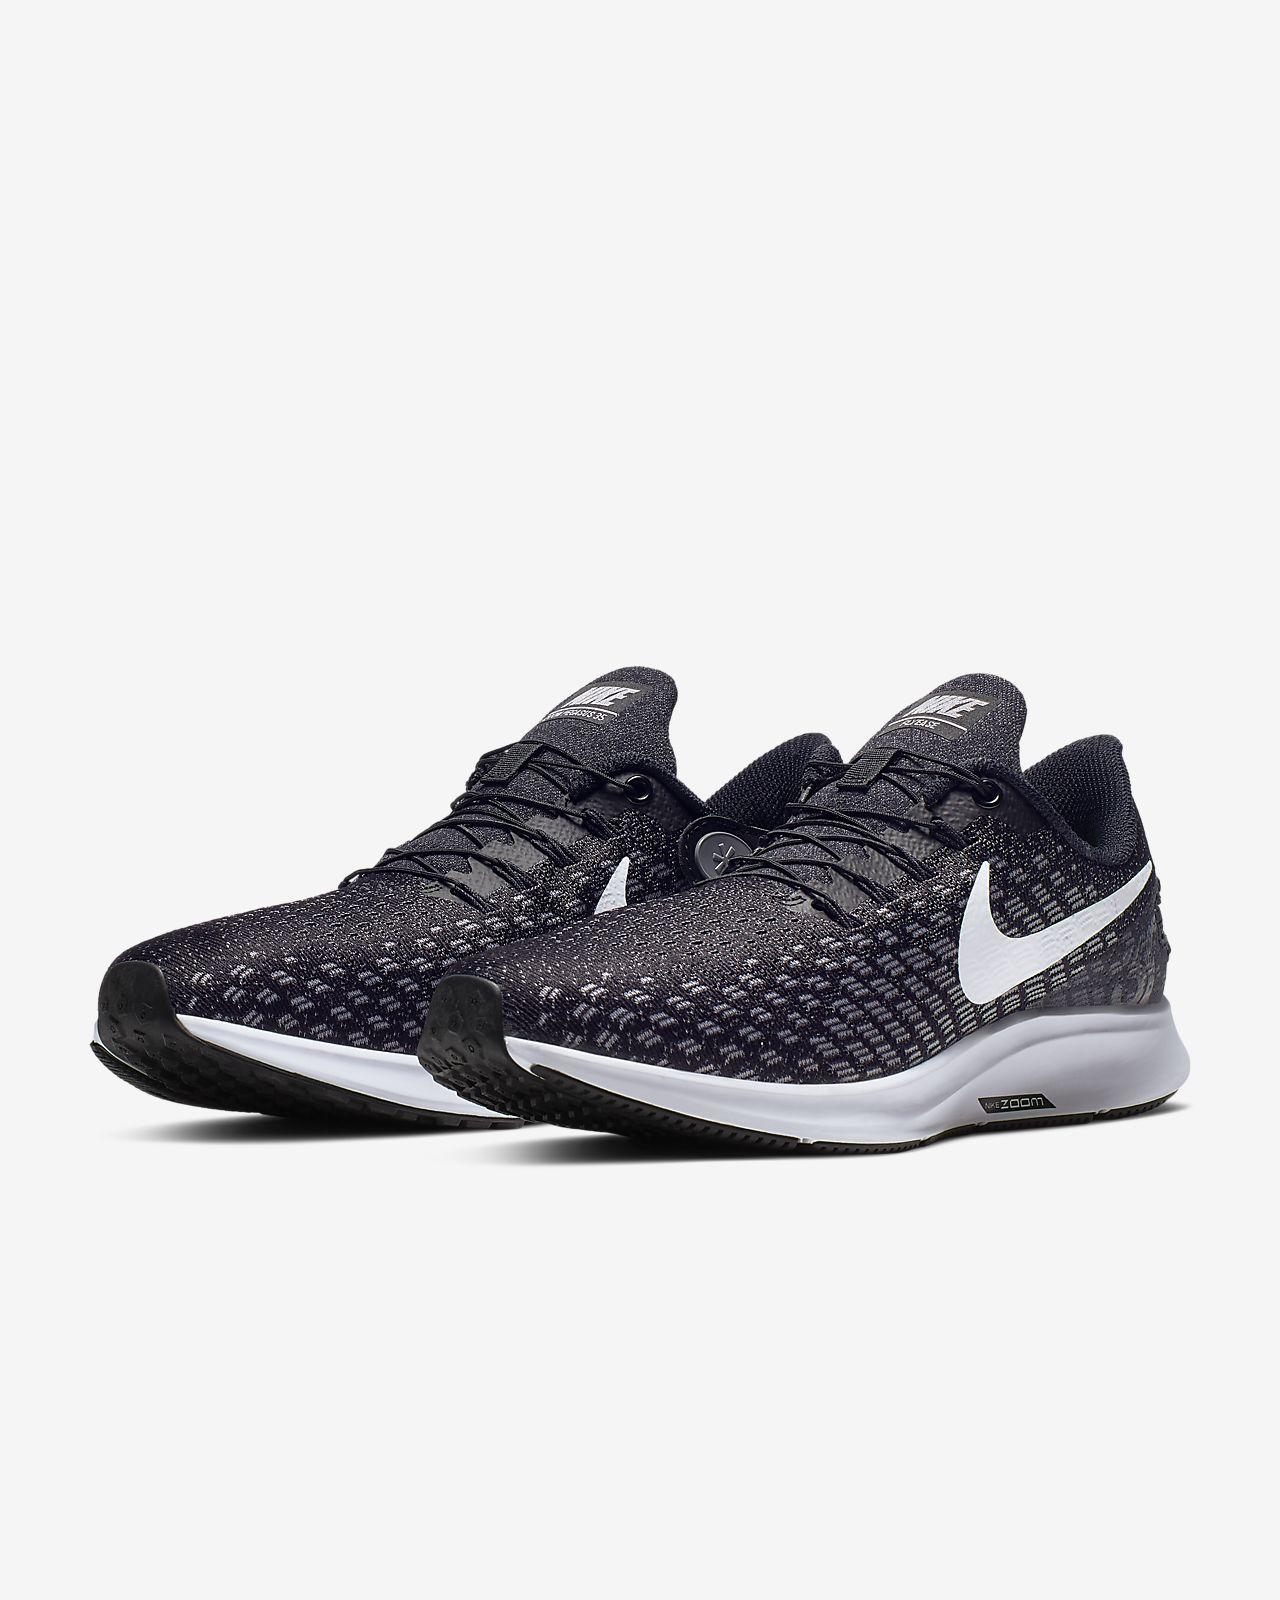 43d14deb03ef8 Nike Air Zoom Pegasus 35 FlyEase Women s Running Shoe. Nike.com AU